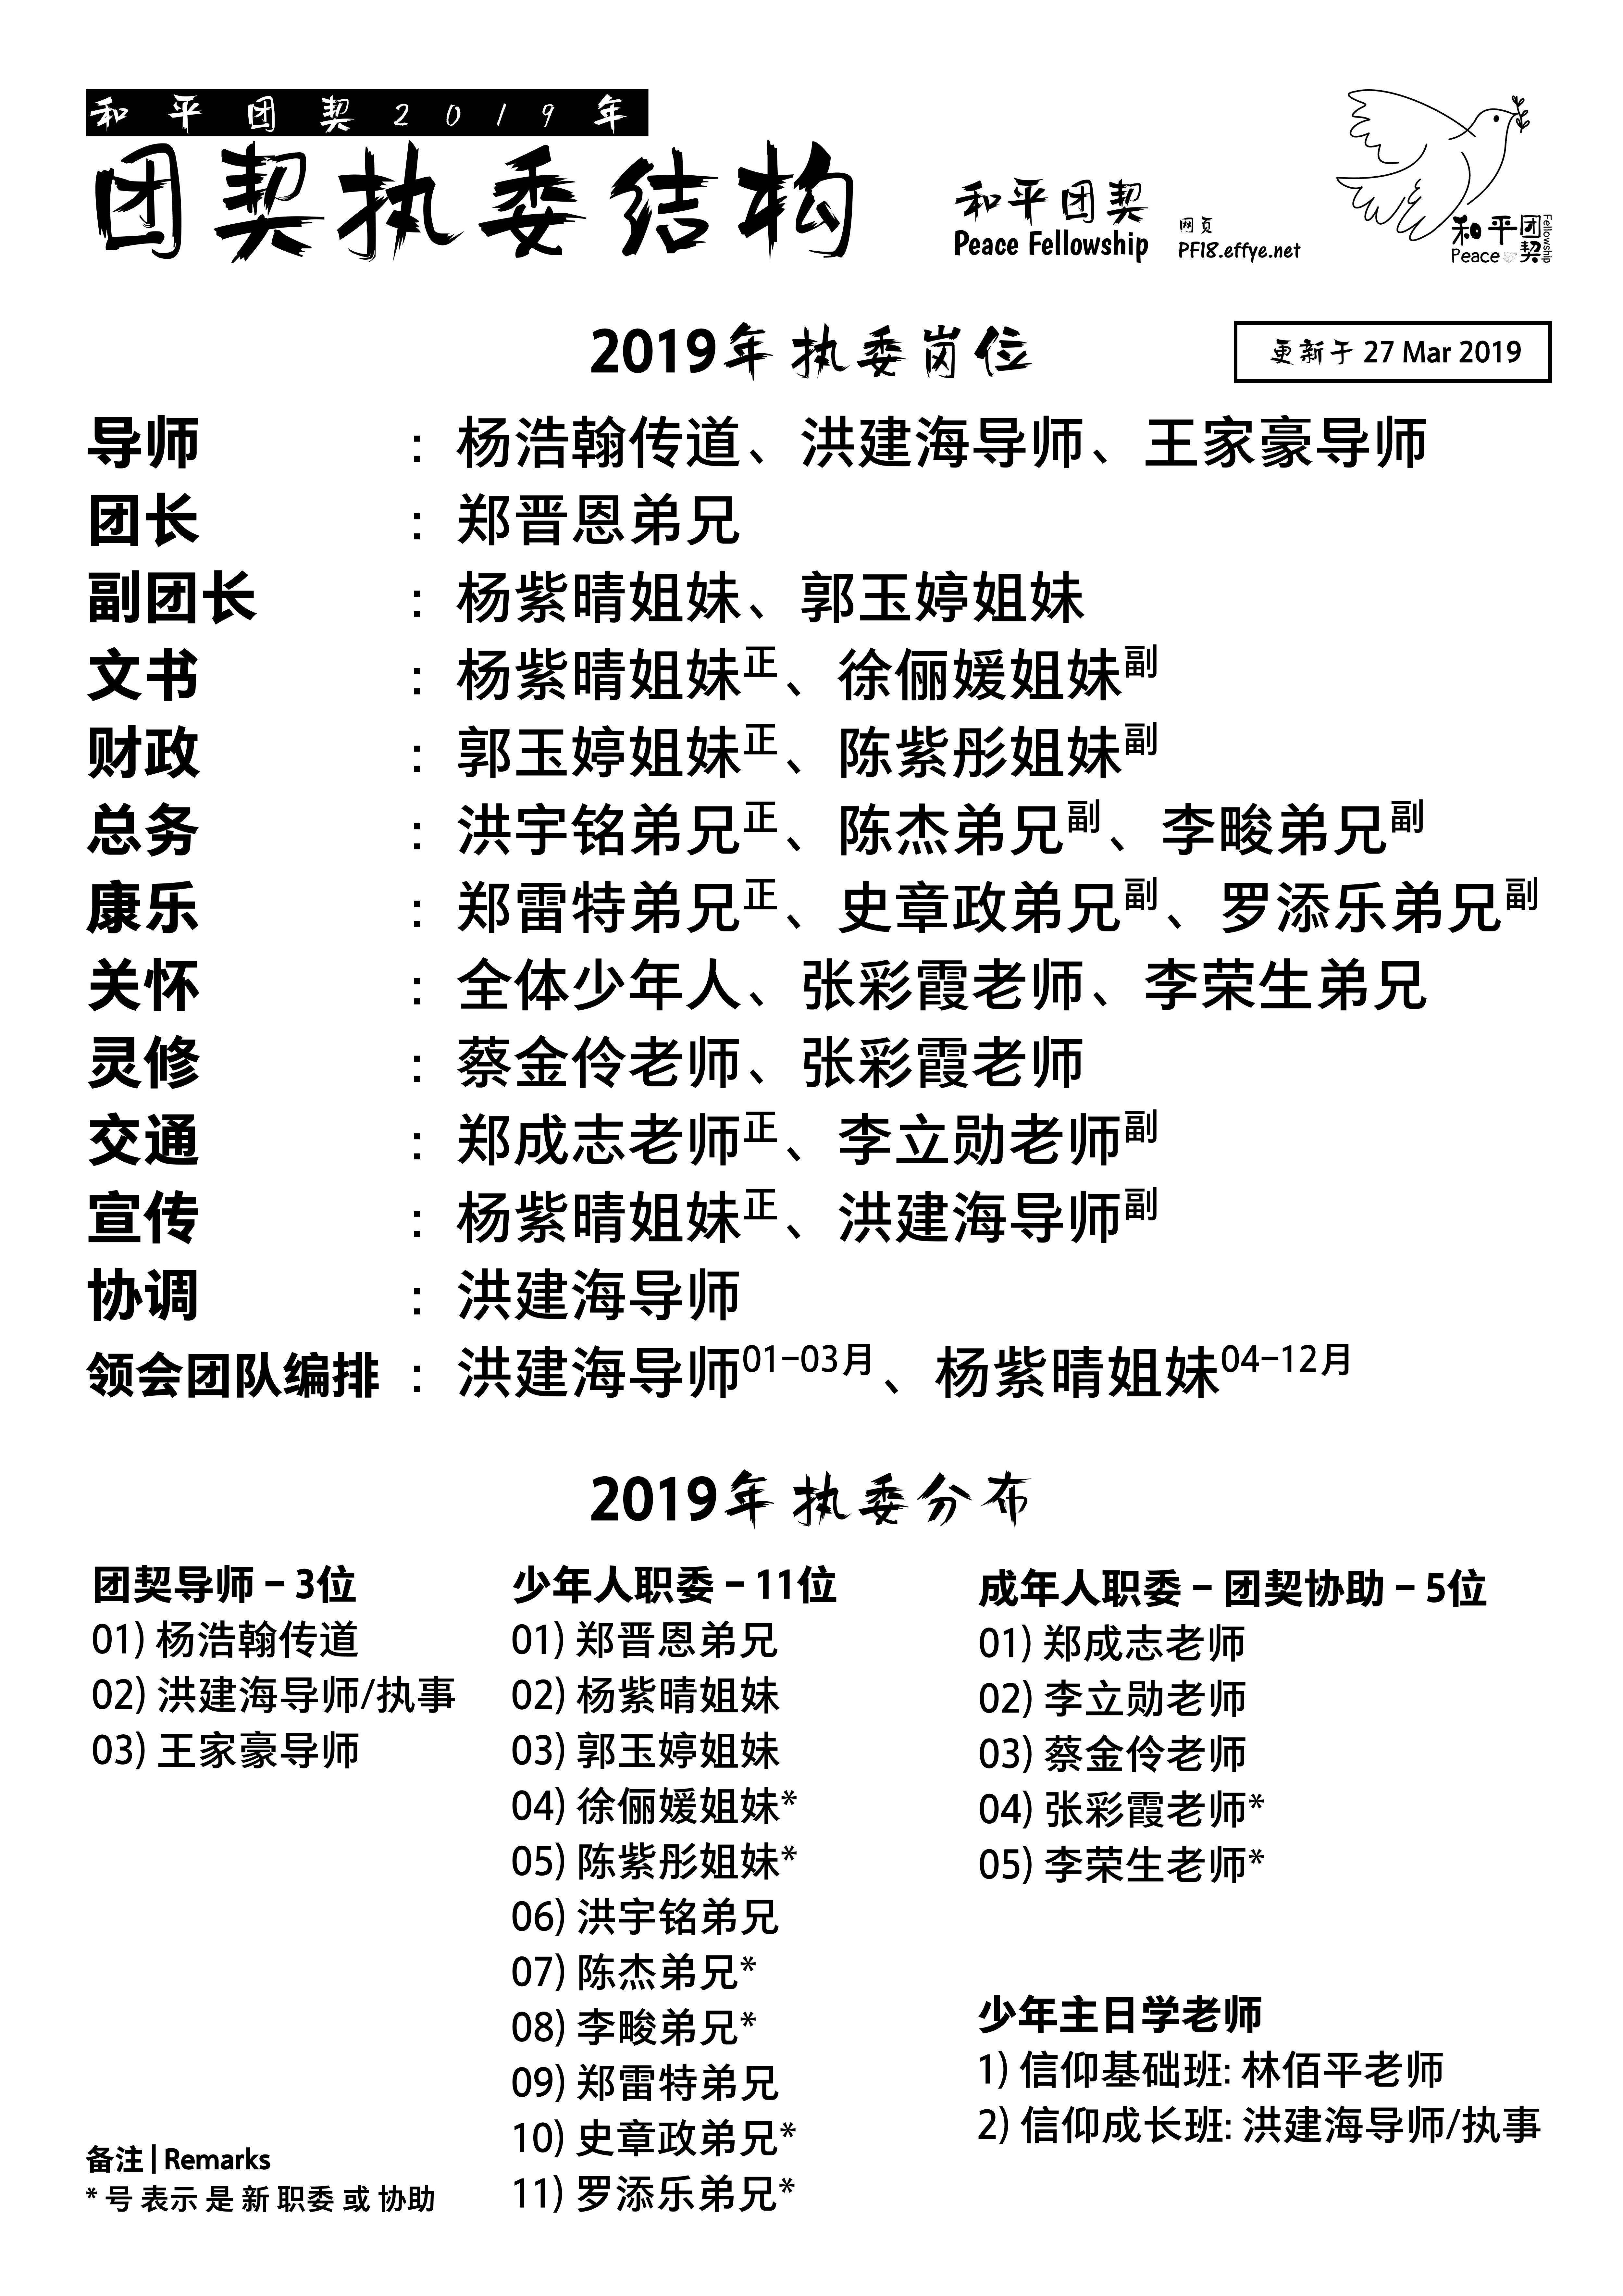 A00 和平团契 2019年 执委 结构-update 27 March